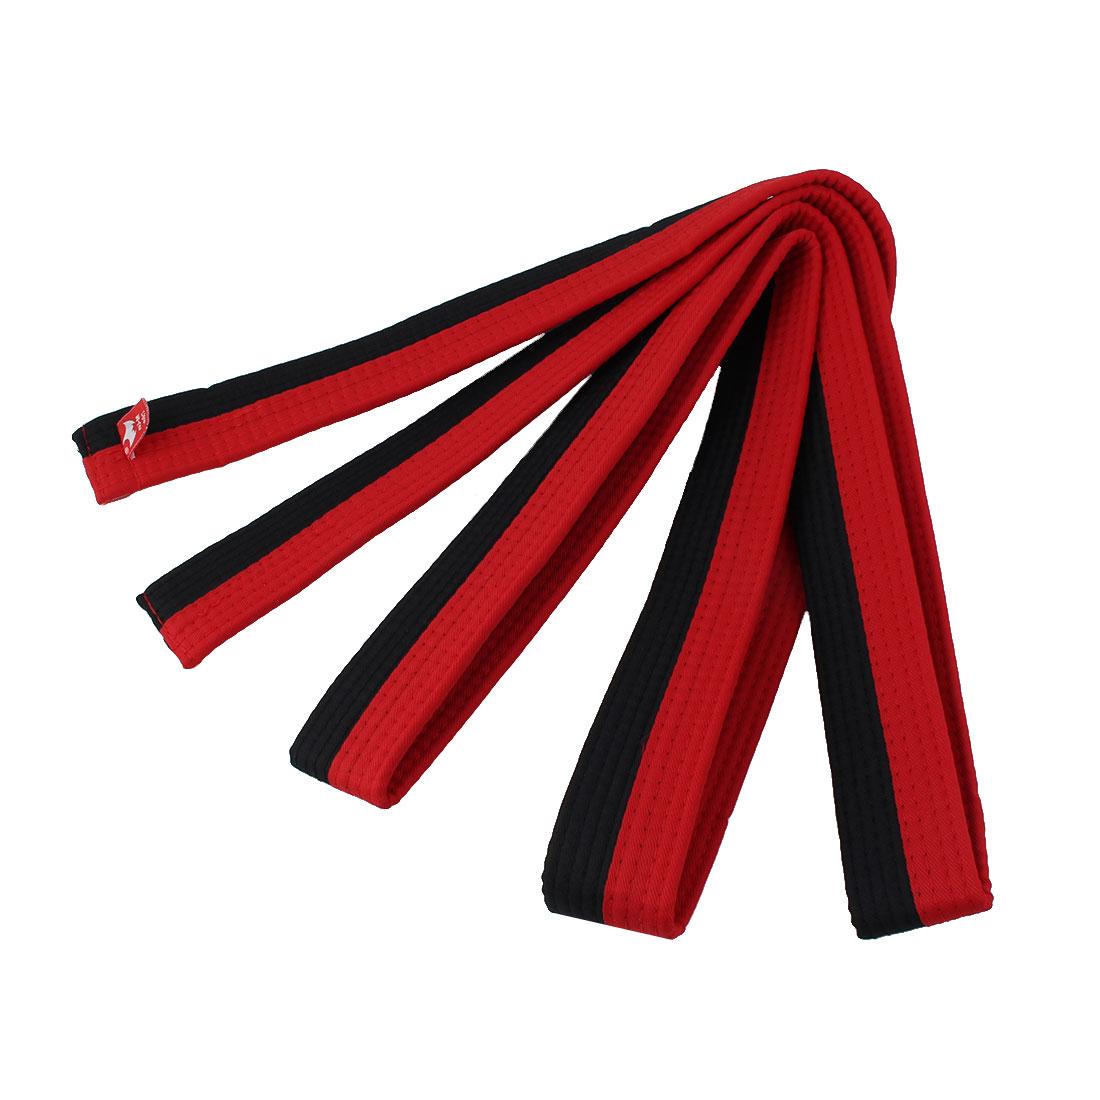 Judo Taekwondo Cotton Blend Band Belt Red Black 250cm Length